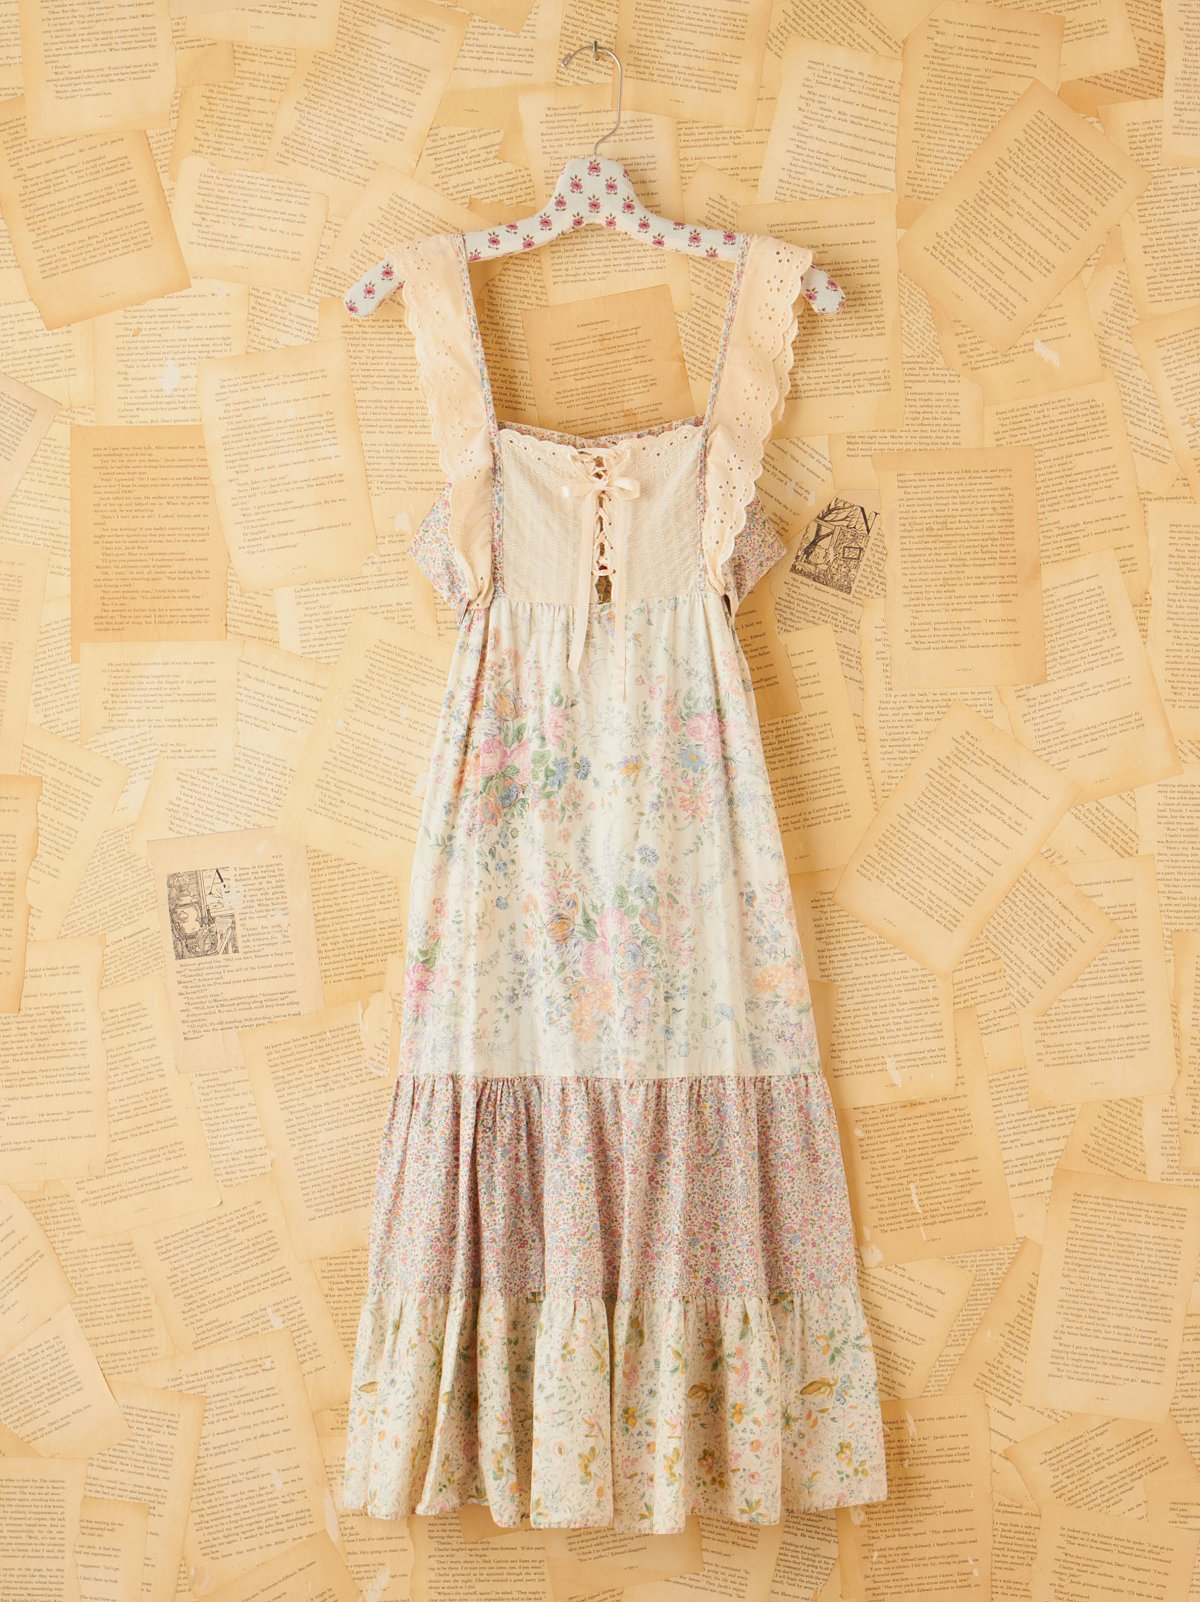 Vintage Printed Tiered Hippie Dress